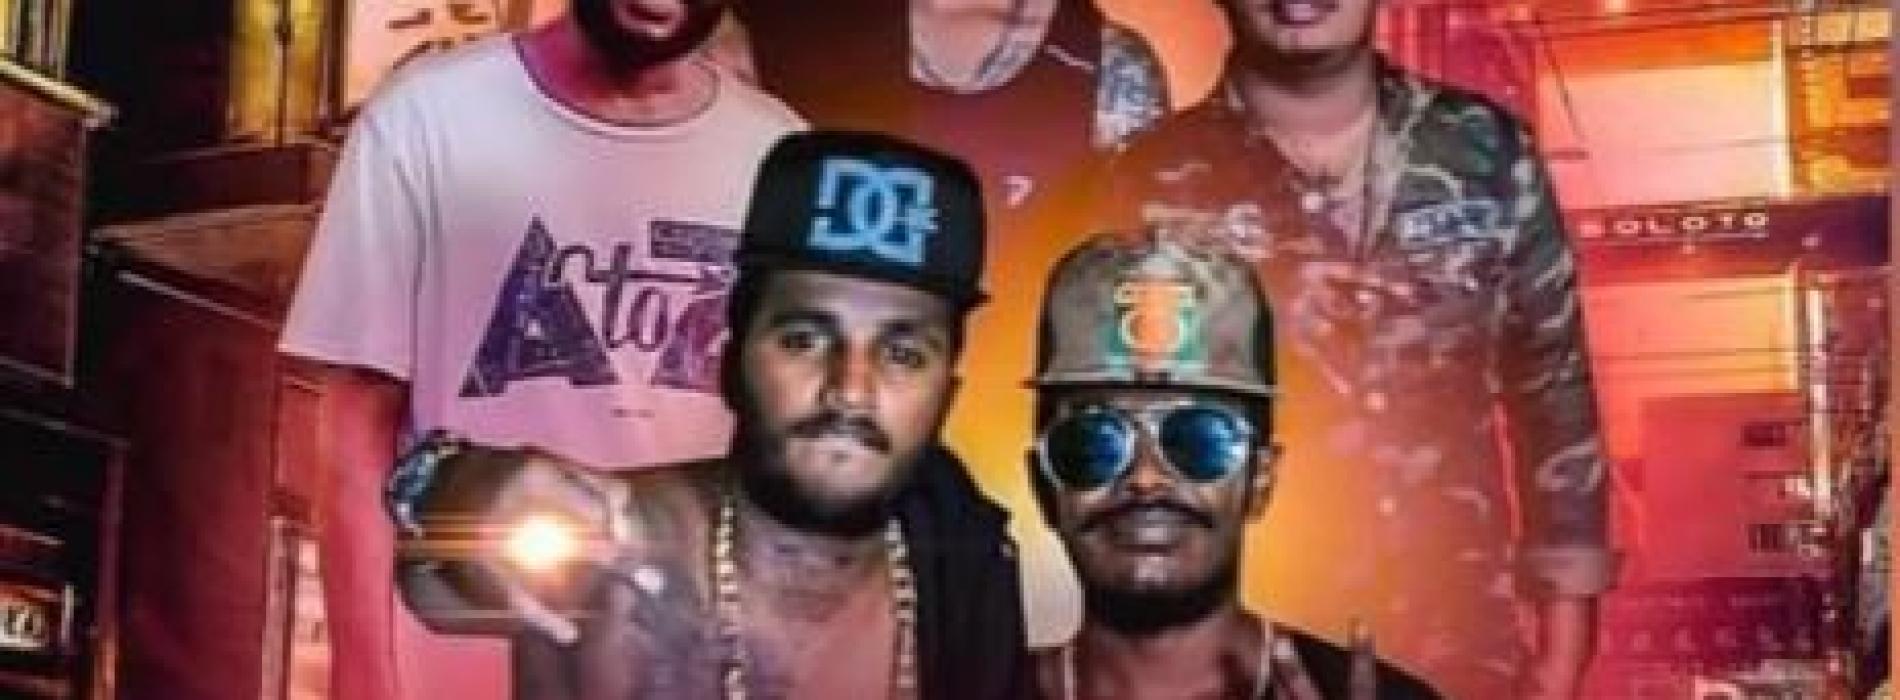 New Music : Maa Mathweela – මා මත්වීලා – Lil Rome Official Music Video